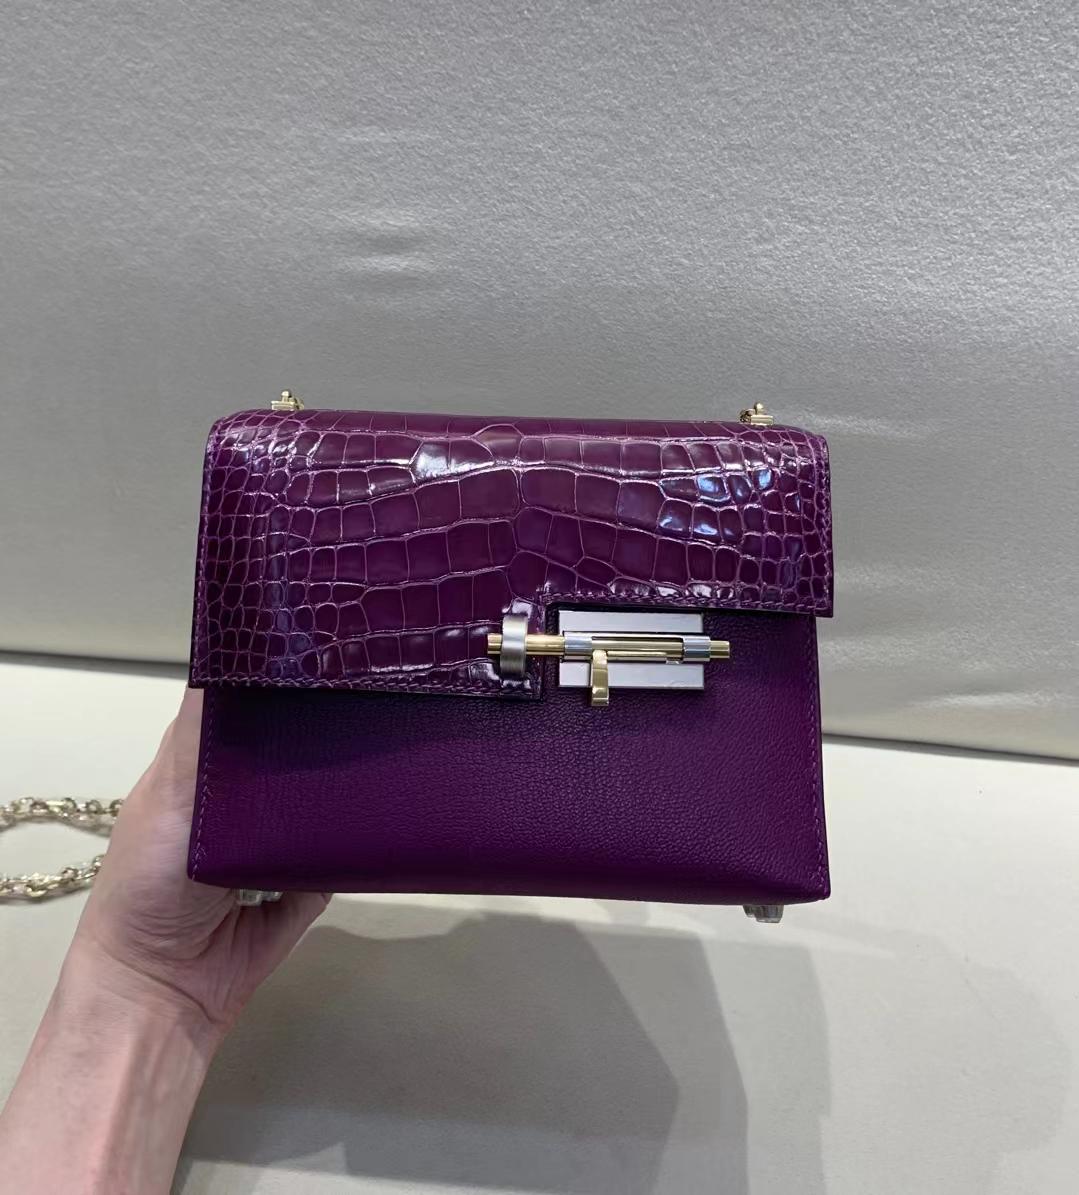 Hermès(爱马仕)Verrou Mini 手枪 插销包 金银渐变扣 N5 黑加仑葡萄紫 美洲方块+山羊皮